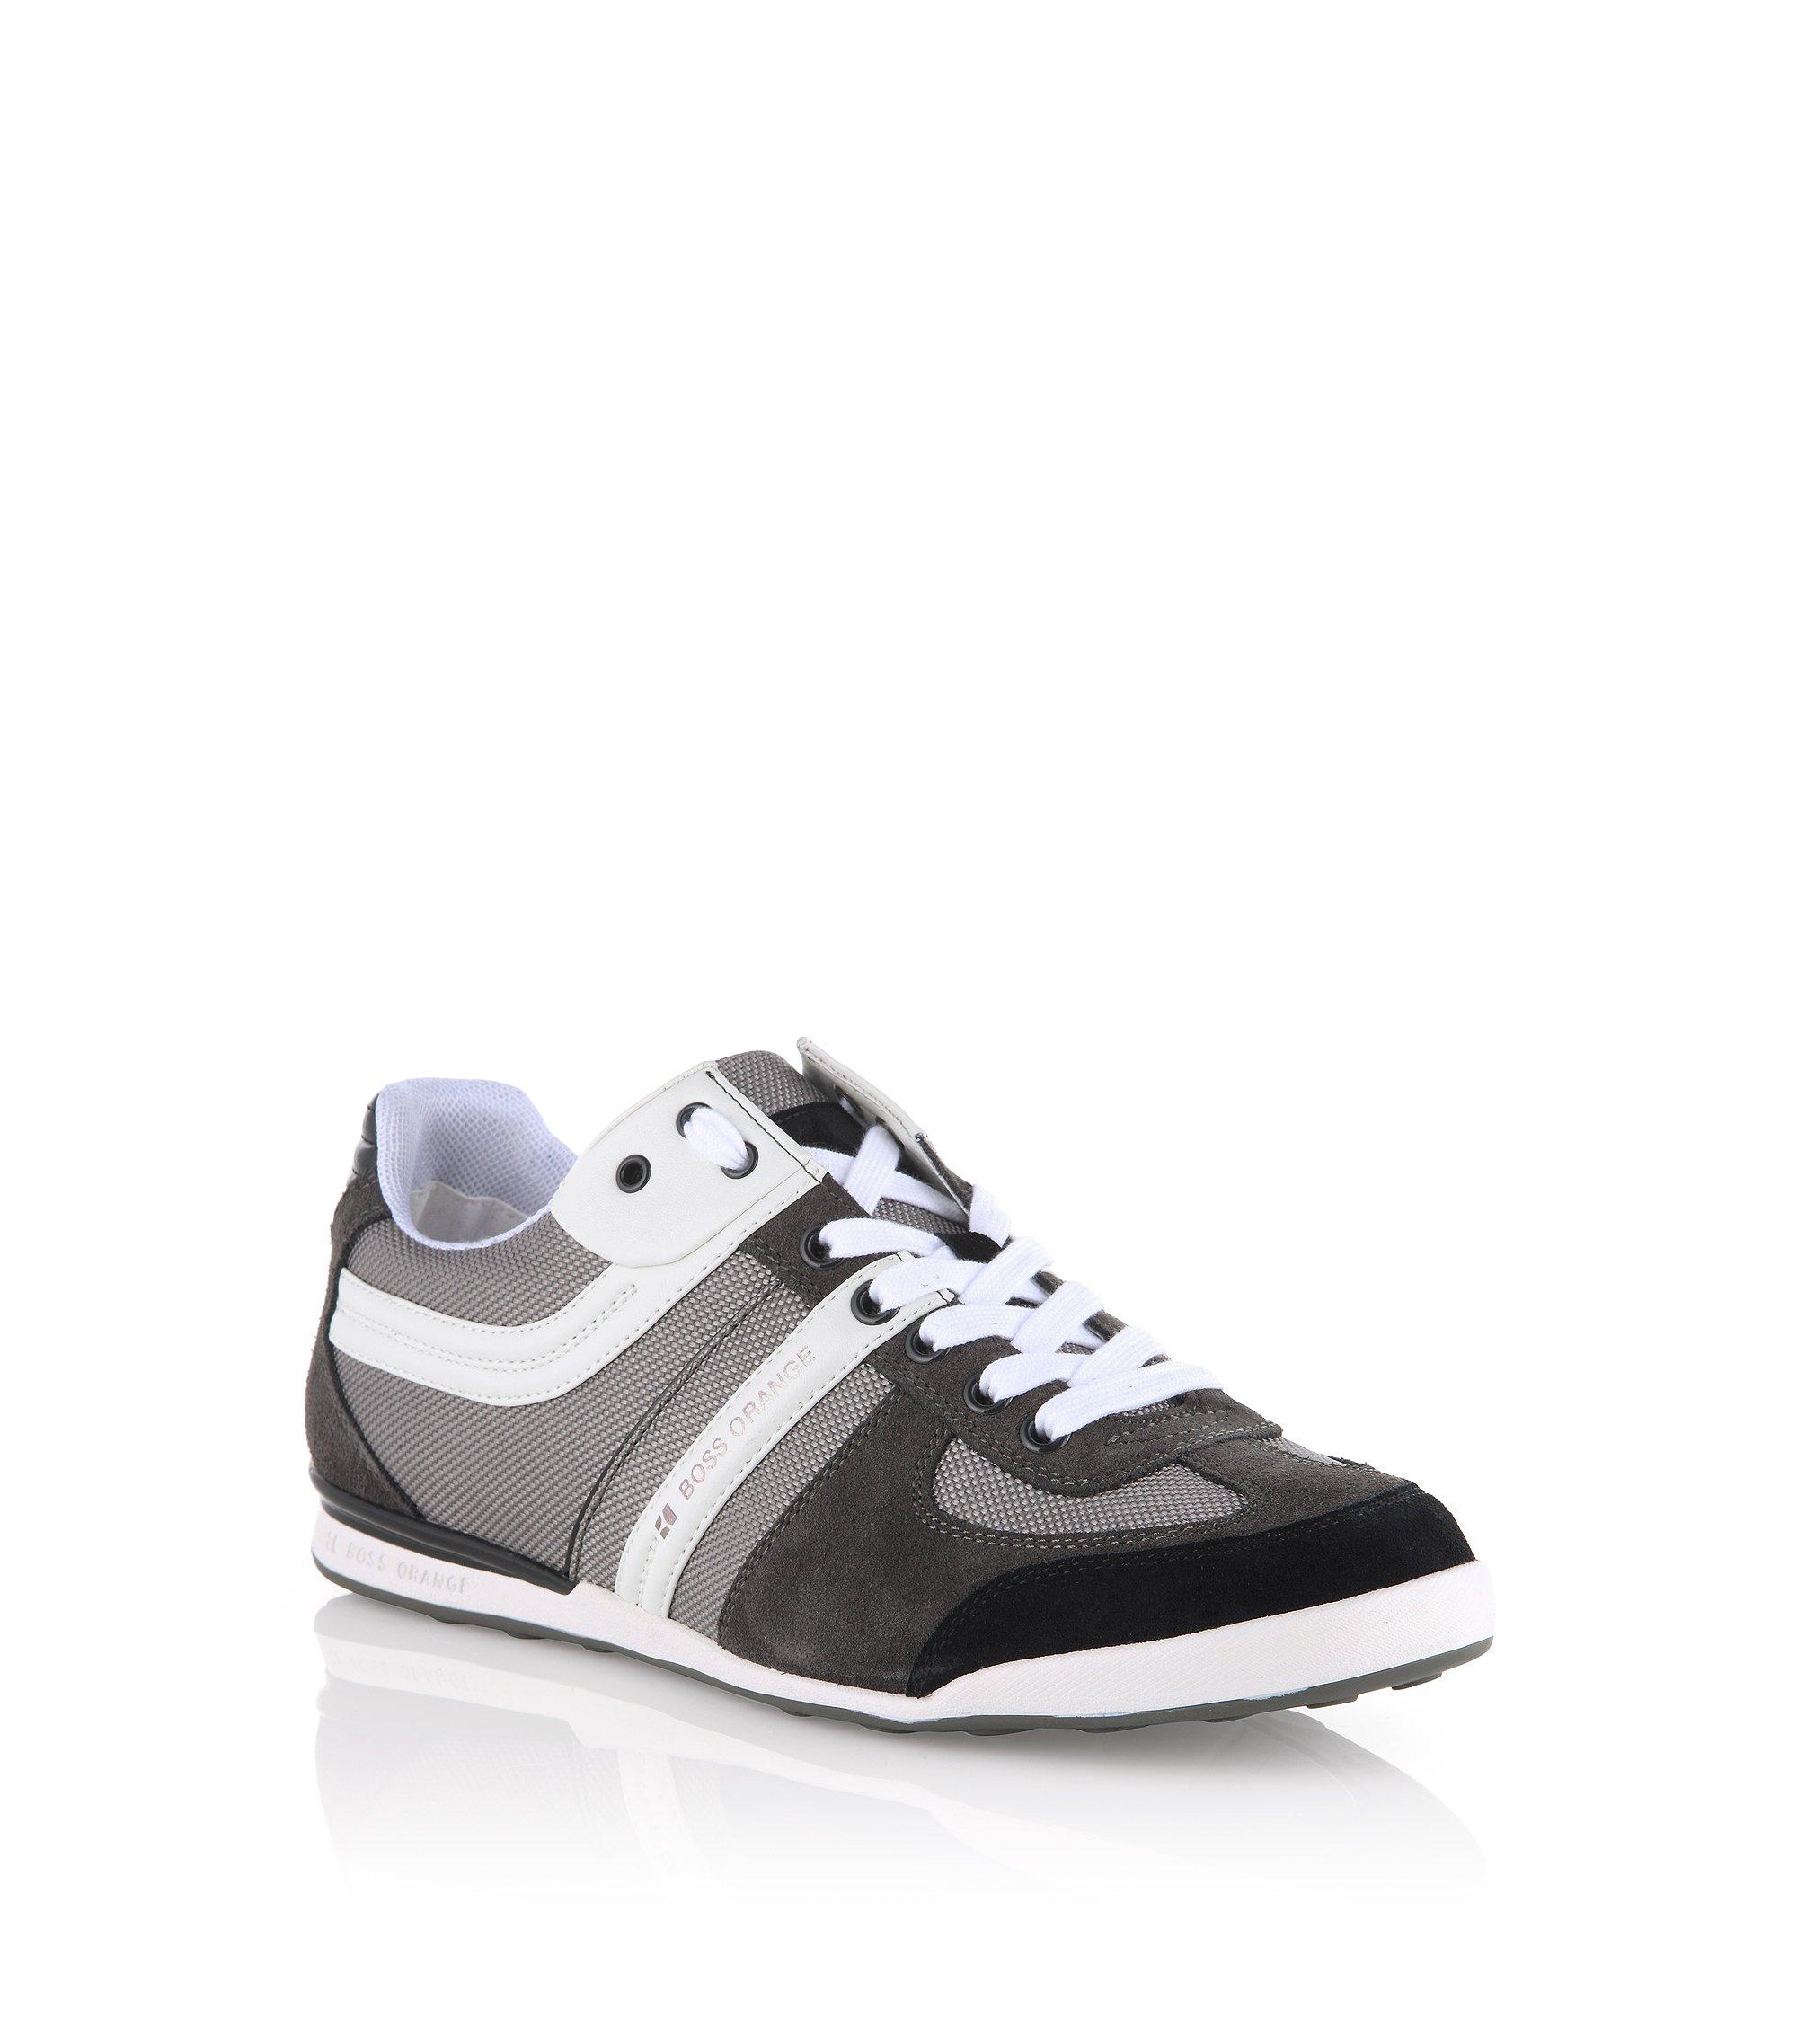 Sneaker ´KEELO` mit Veloursleder und Nylon, Grau